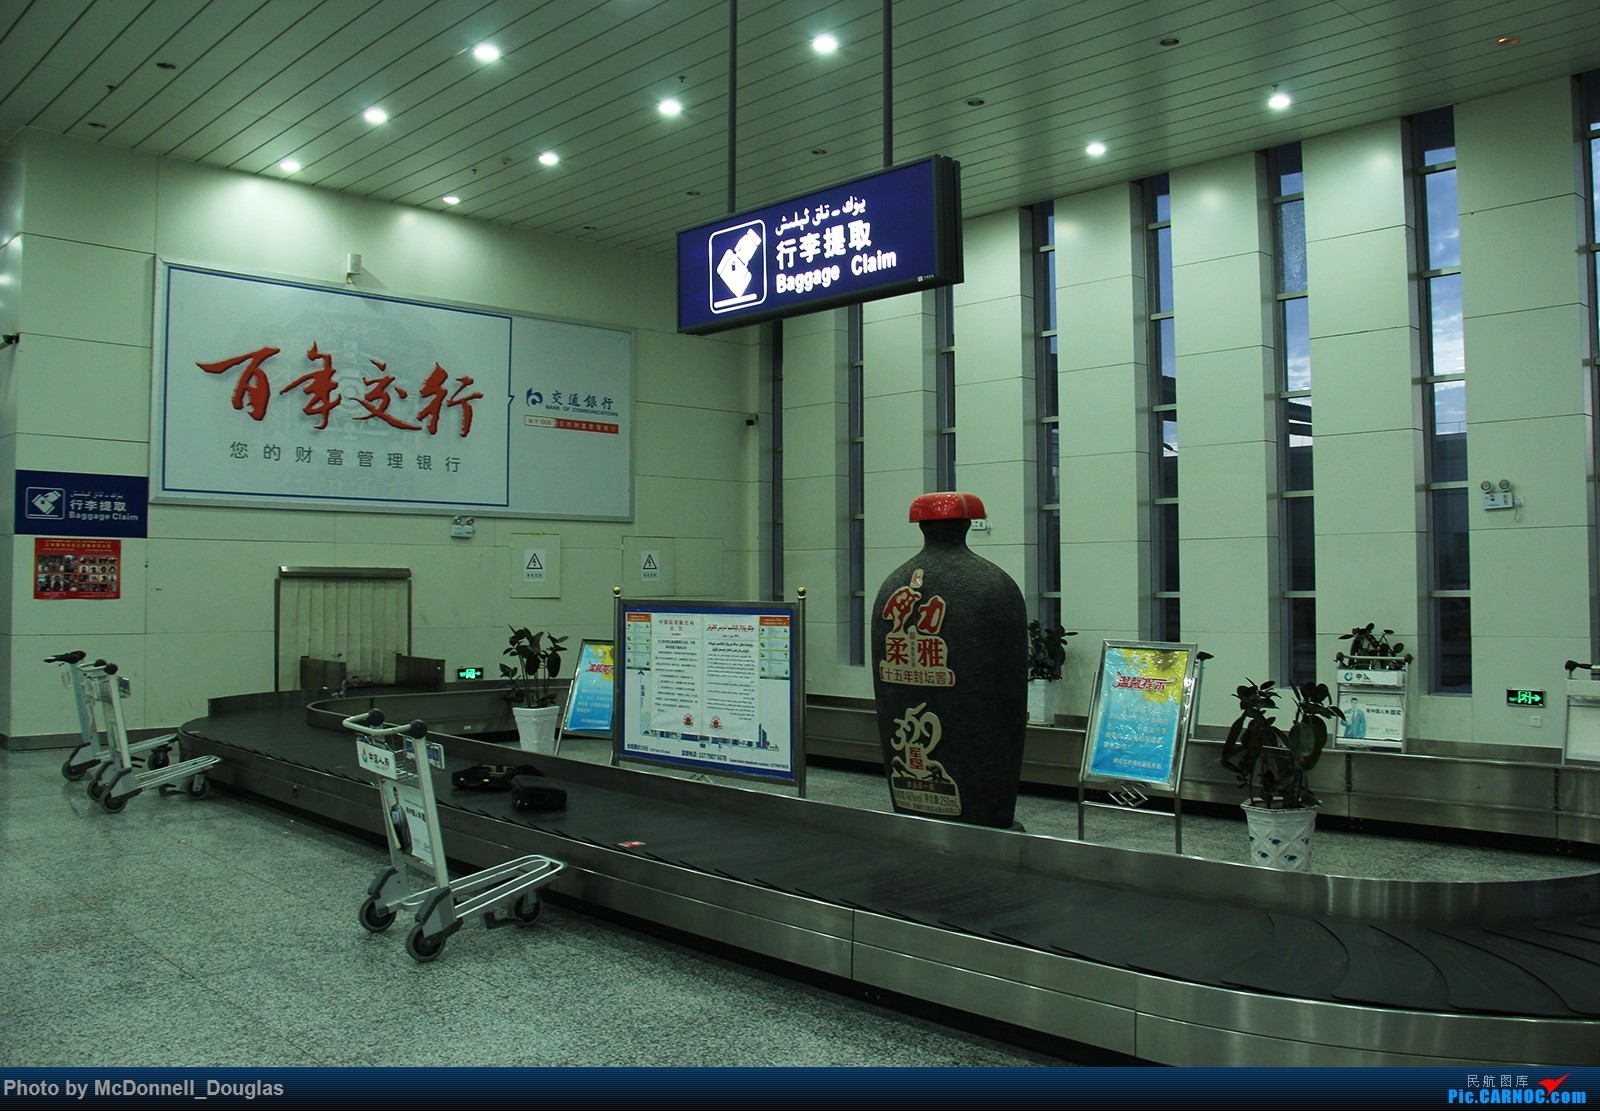 Re:[原创]【上海飞友会】【zc带你走天下(2)】再访祖辈年轻时工作的土地,父母年少时生活戈壁,跨越大半个中国去看新疆,回程小游蓉城(上)    中国阿克苏机场